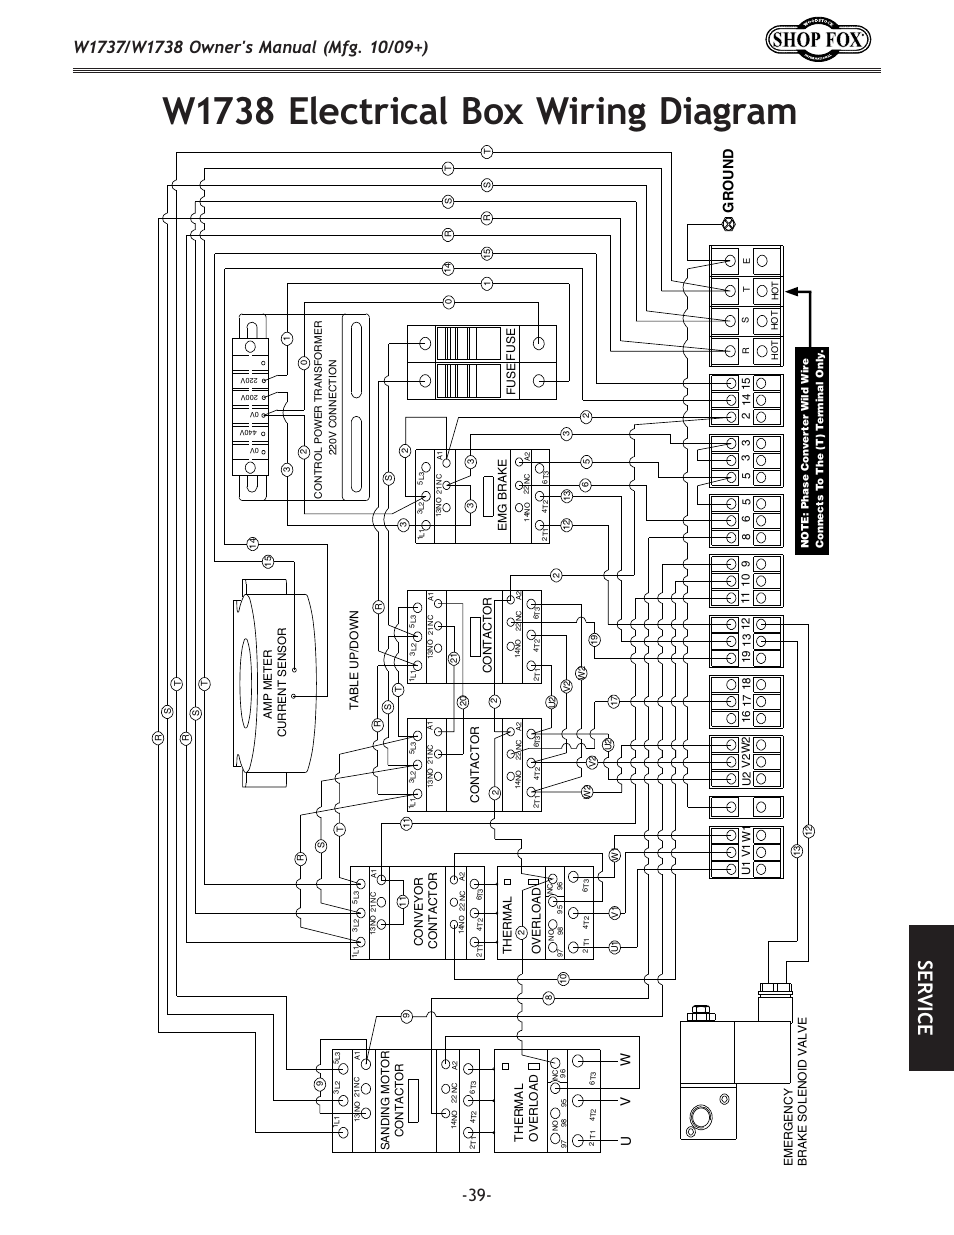 medium resolution of w1738 electrical box wiring diagram se rv ic e ground uv w